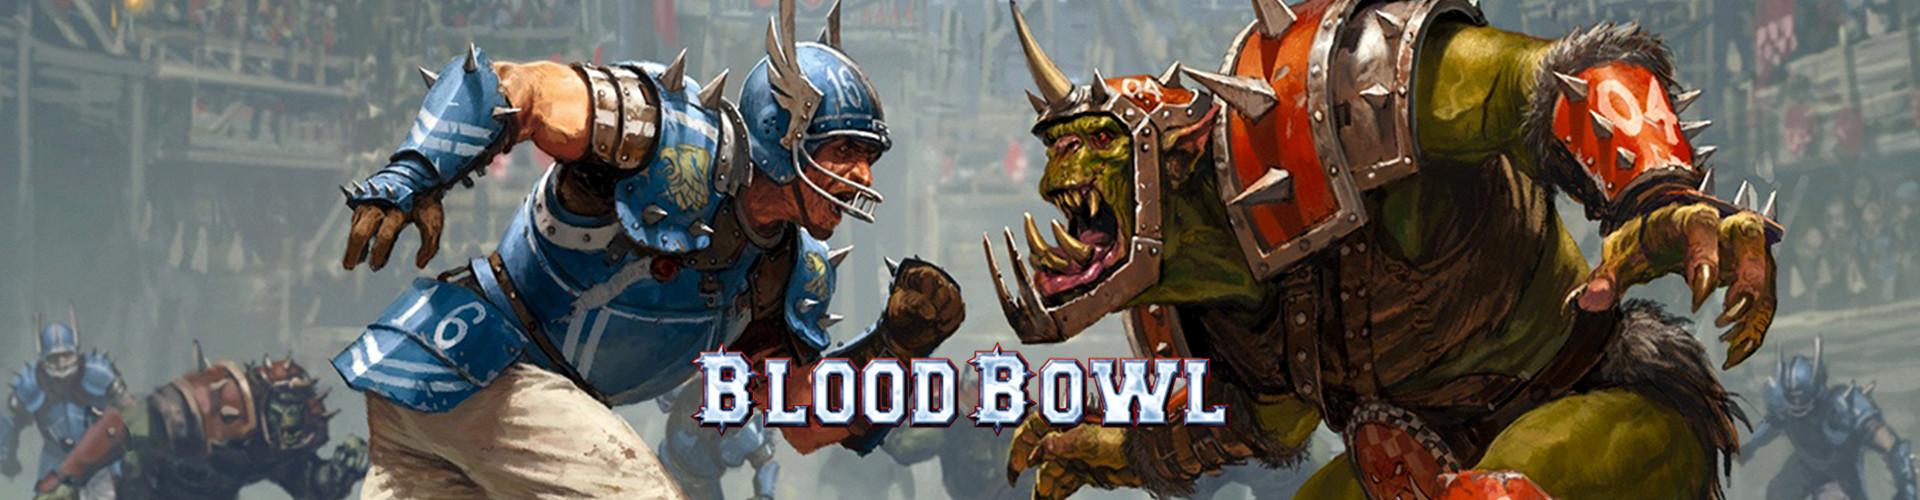 DEMO 03 Blood Bowl - Demospiele: BLOOD BOWL